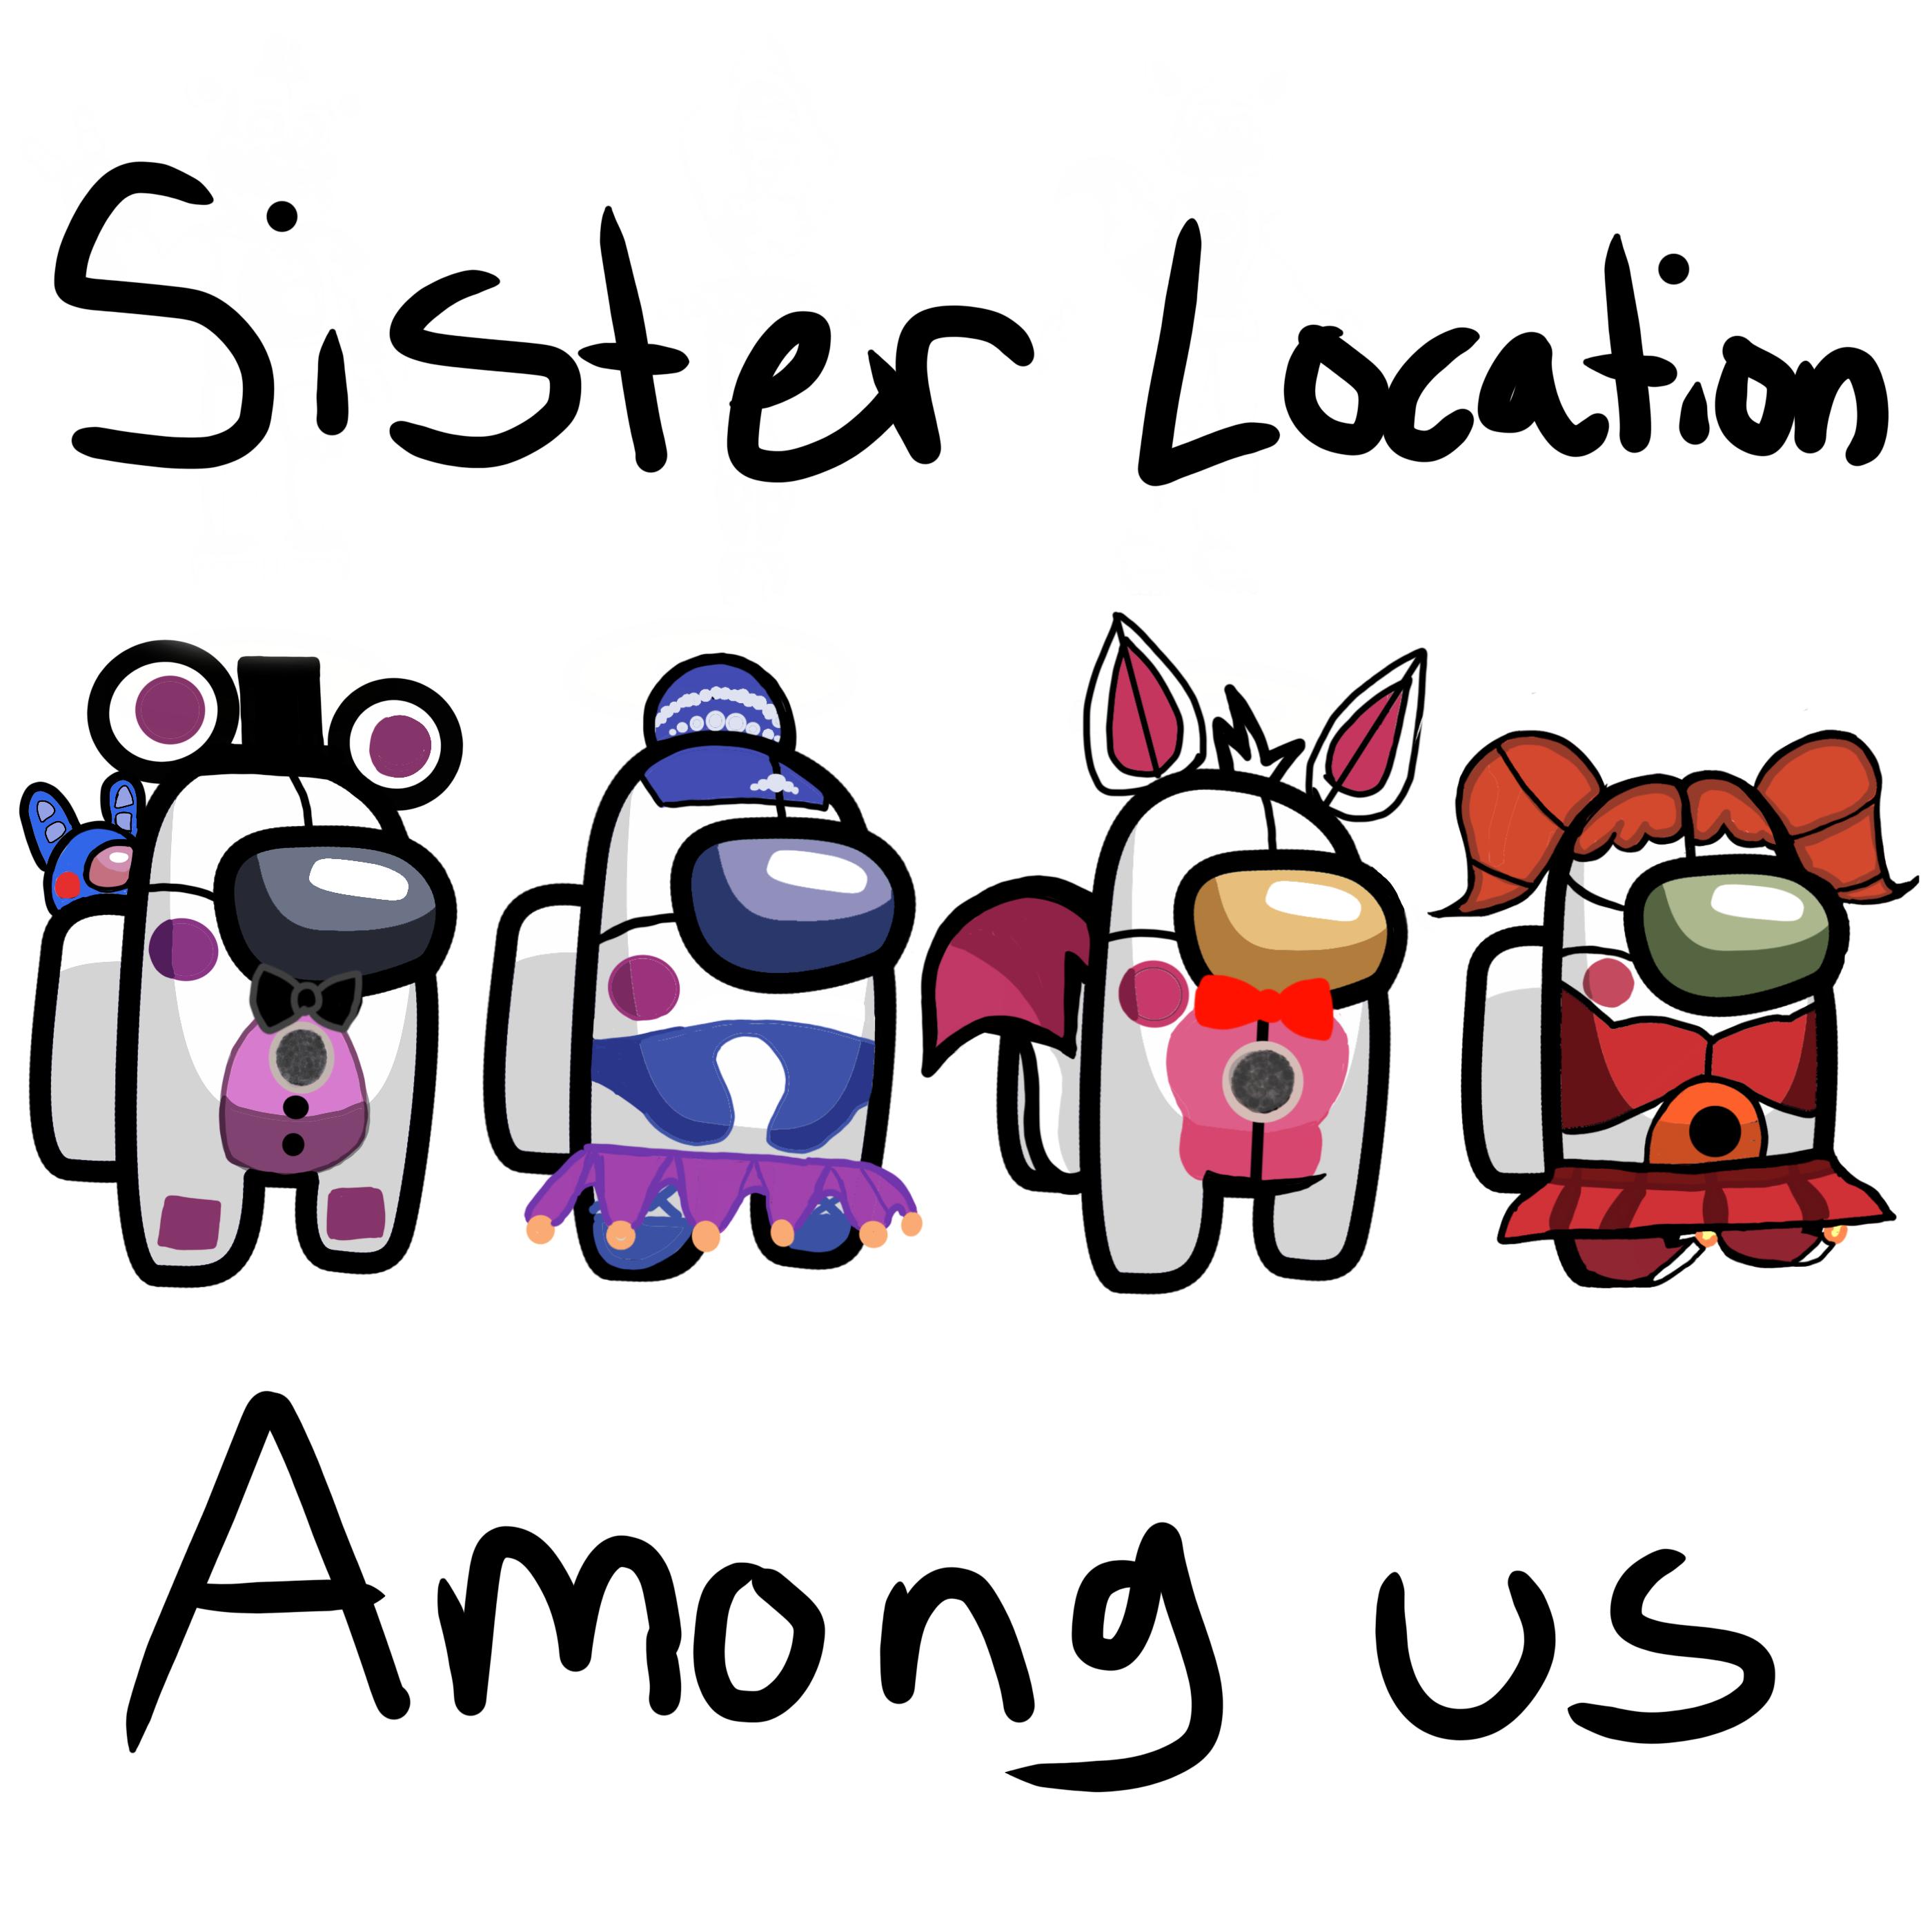 Sister Location Among Us Skins By Carmendelgado0306 On Deviantart